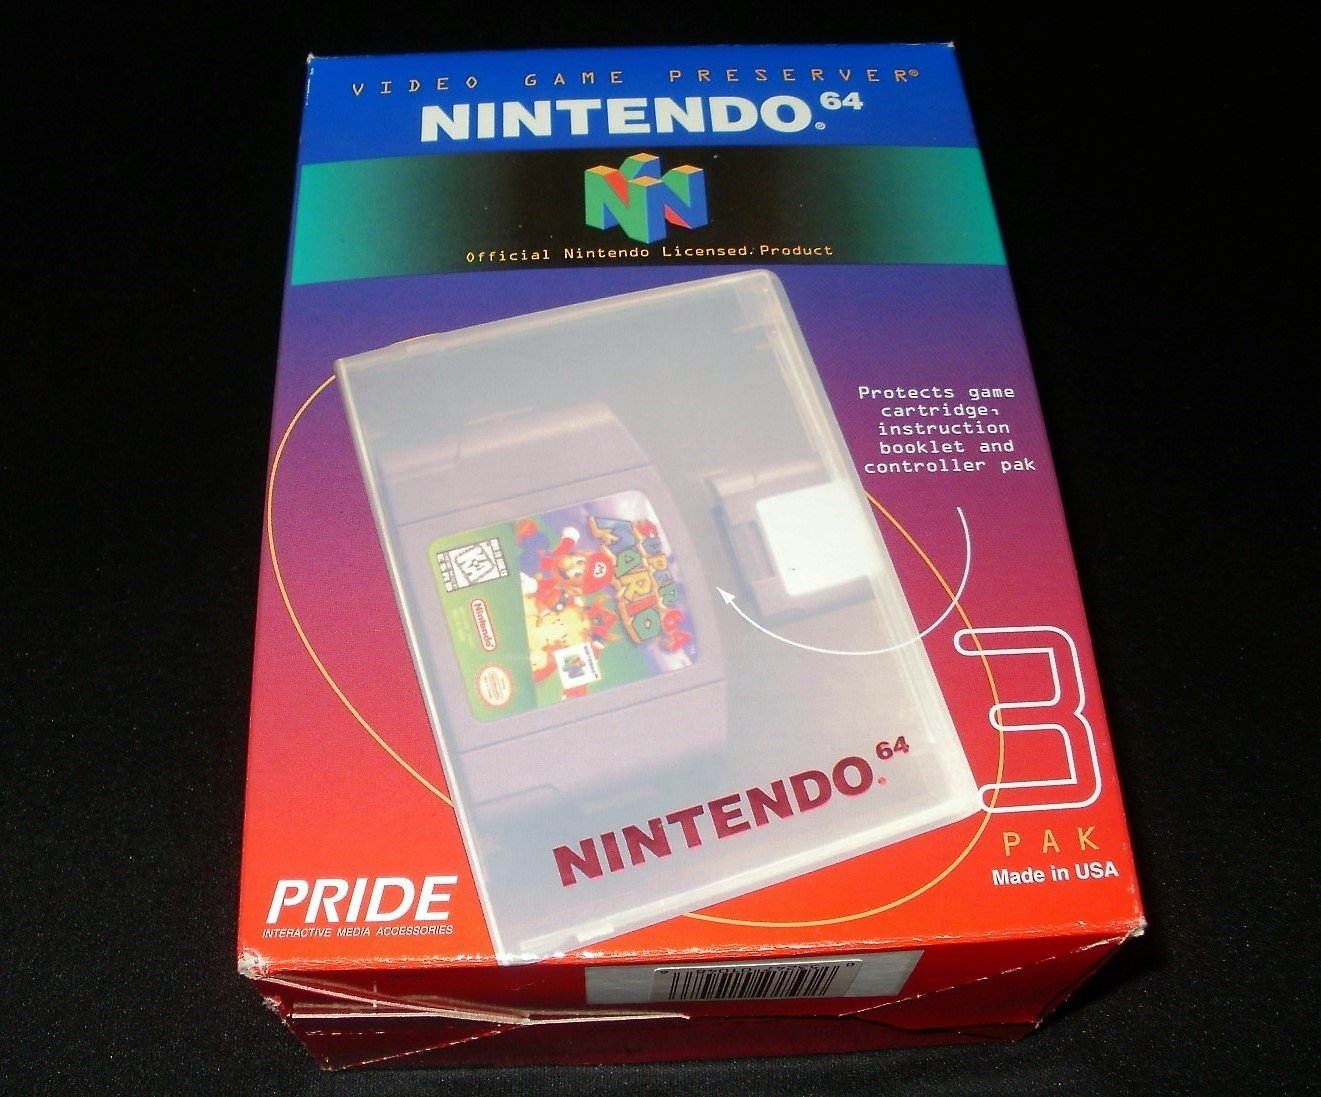 Video Game Preserver 3 Pak Blue - N64 Nintendo - Brand New Factory Sealed - Rare